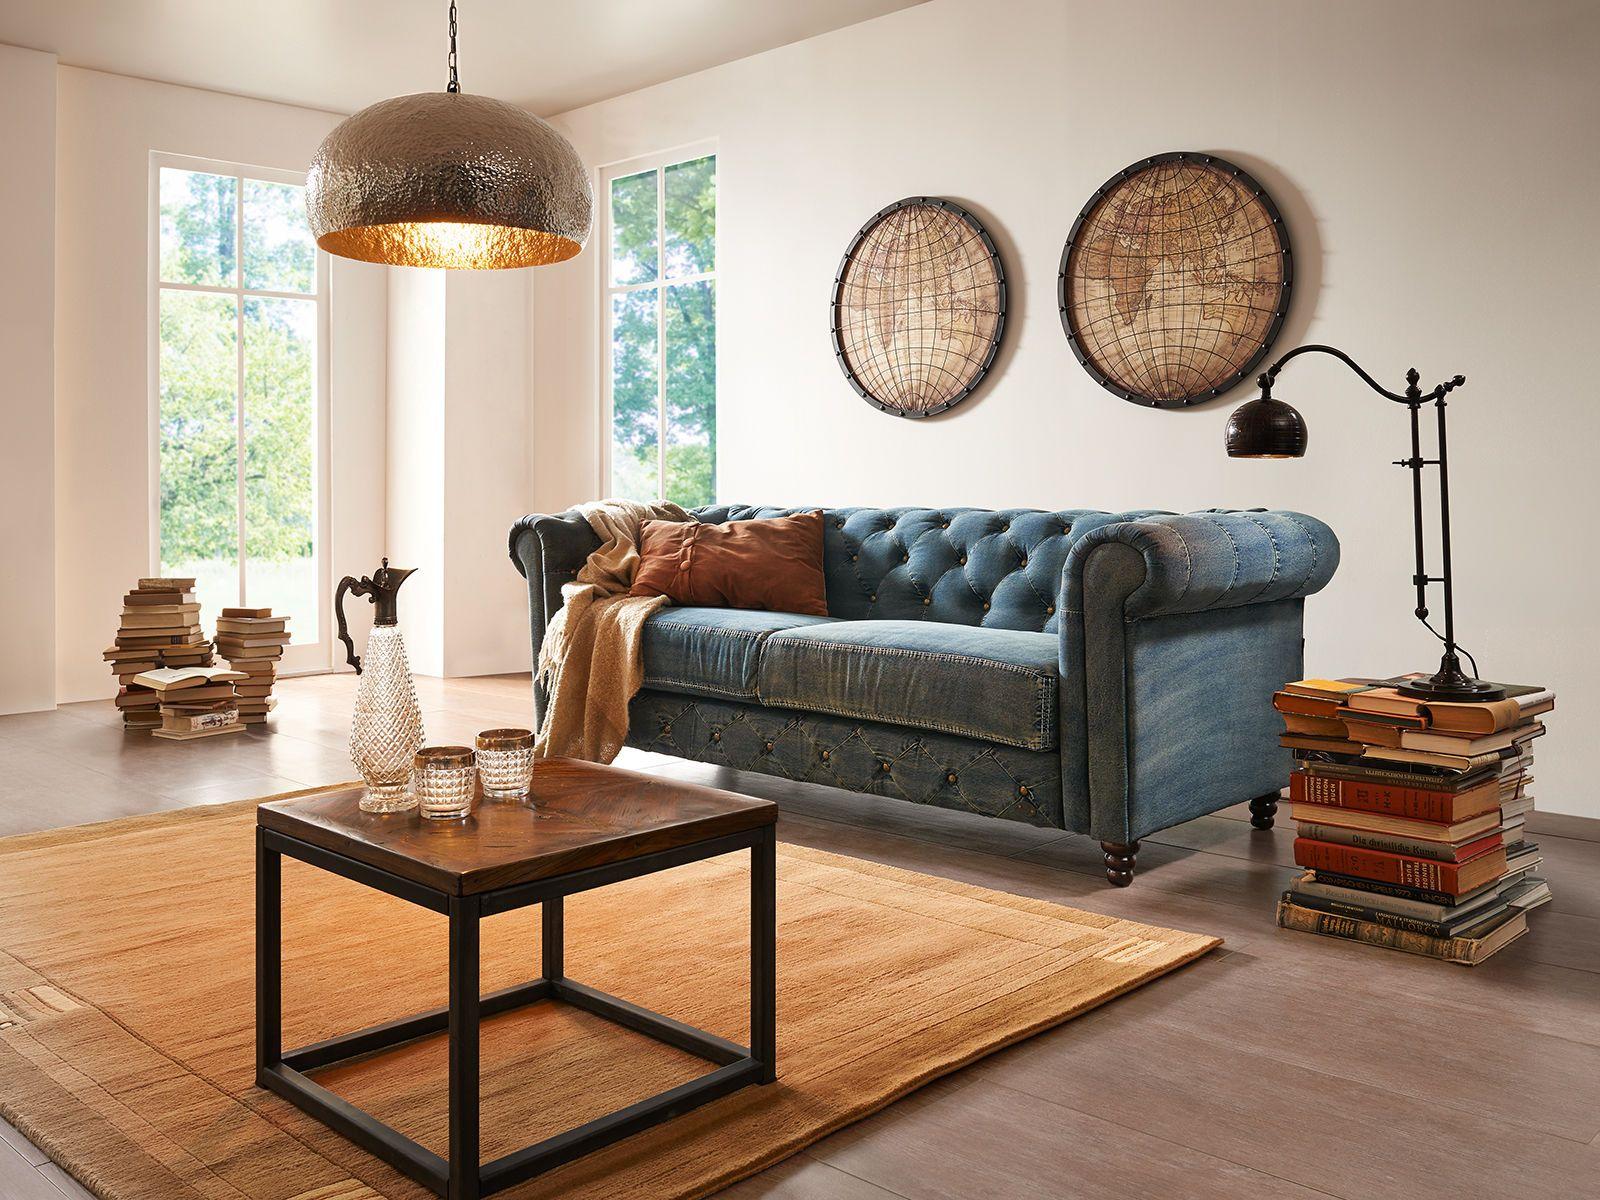 Chesterfield Sofa Jeans 17-Sitzer  Chesterfield sofa, Wohnzimmer